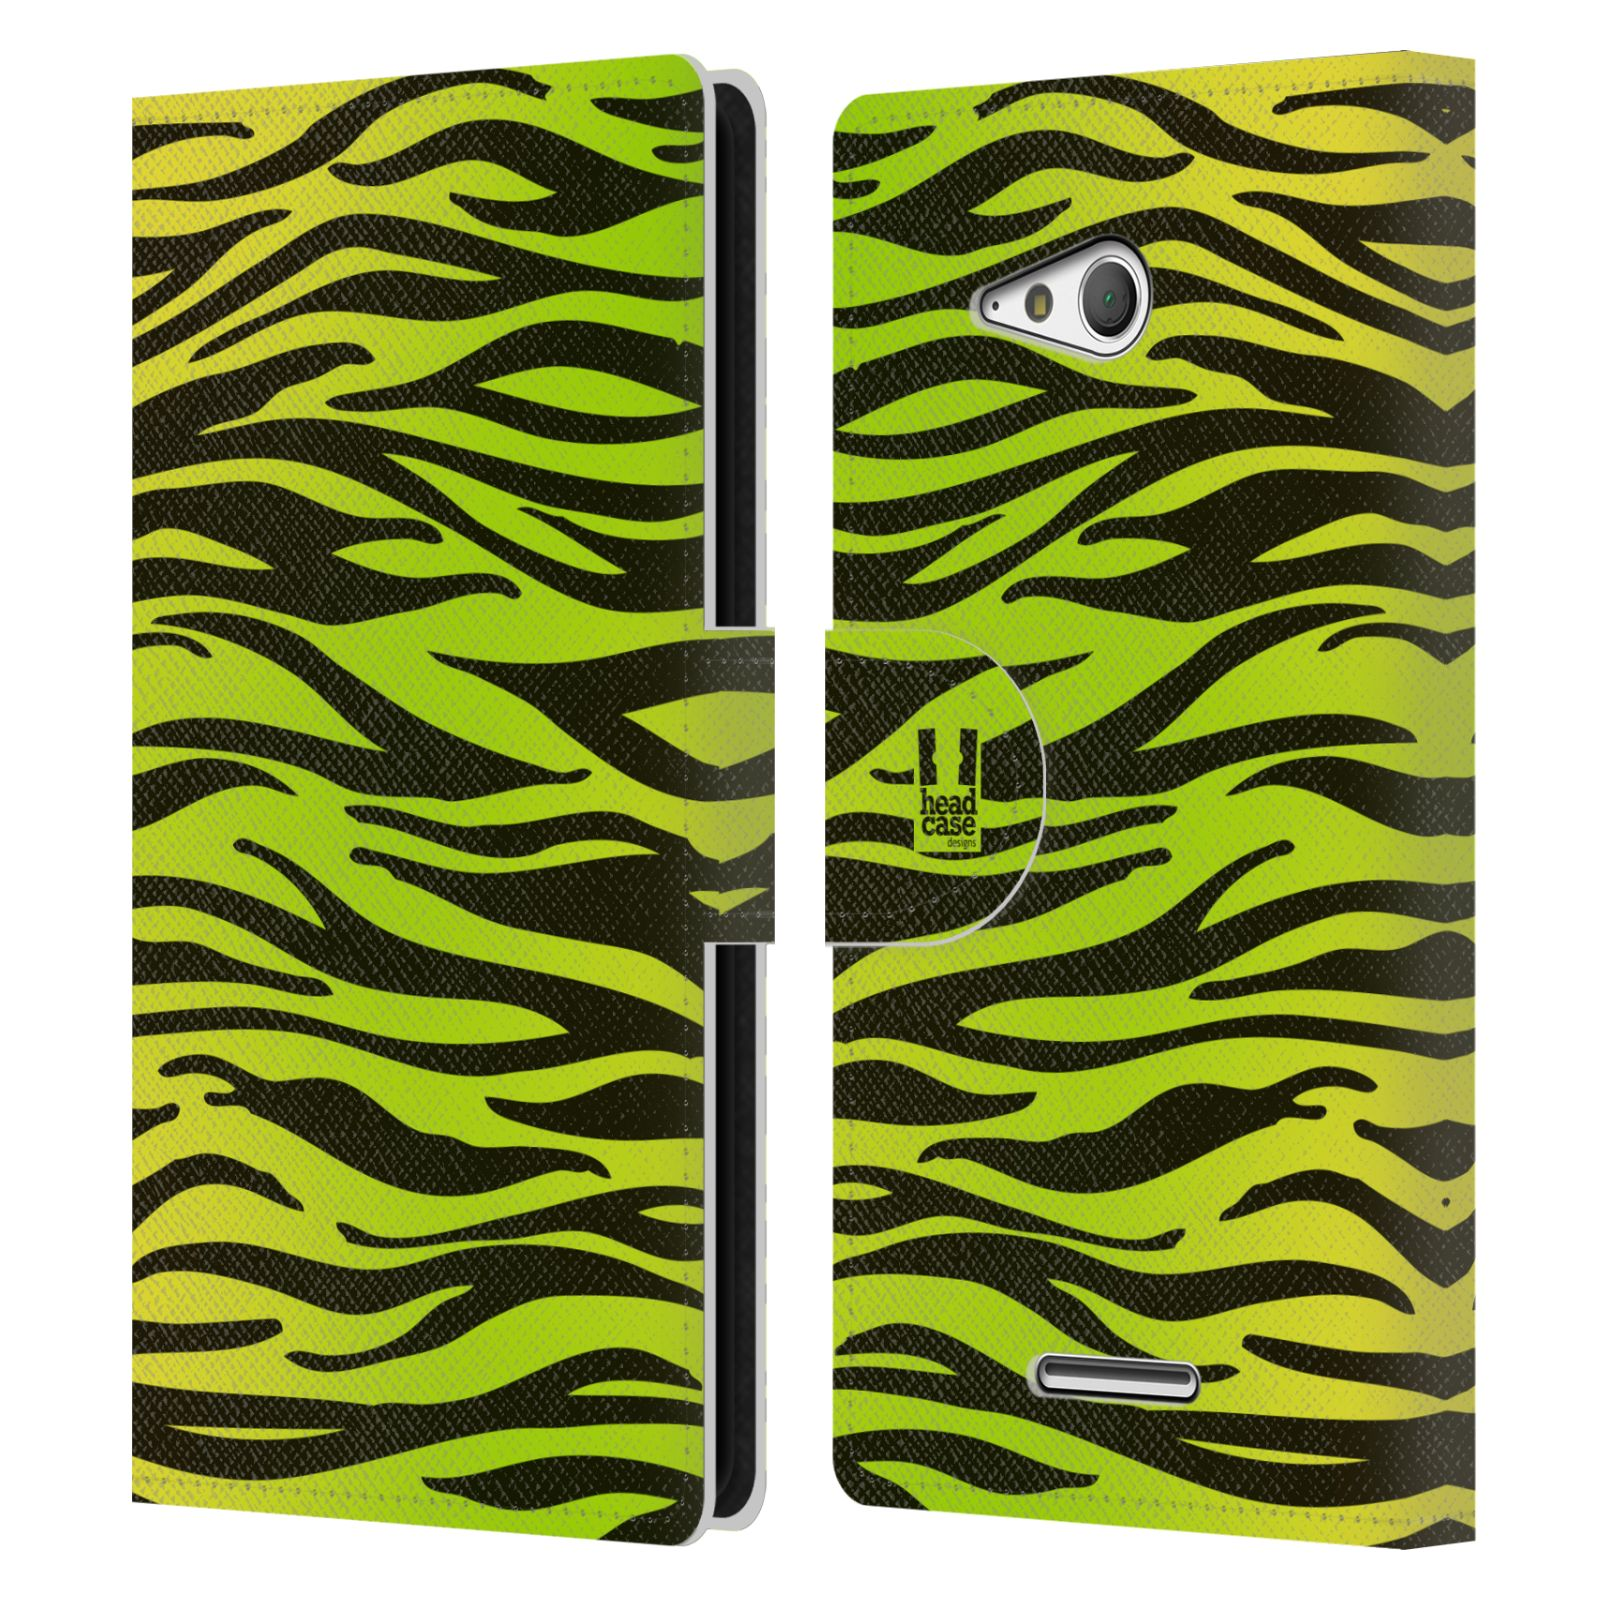 HEAD CASE Flipové pouzdro pro mobil SONY XPERIA E4g Zvířecí barevné vzory žlutozelená zebra